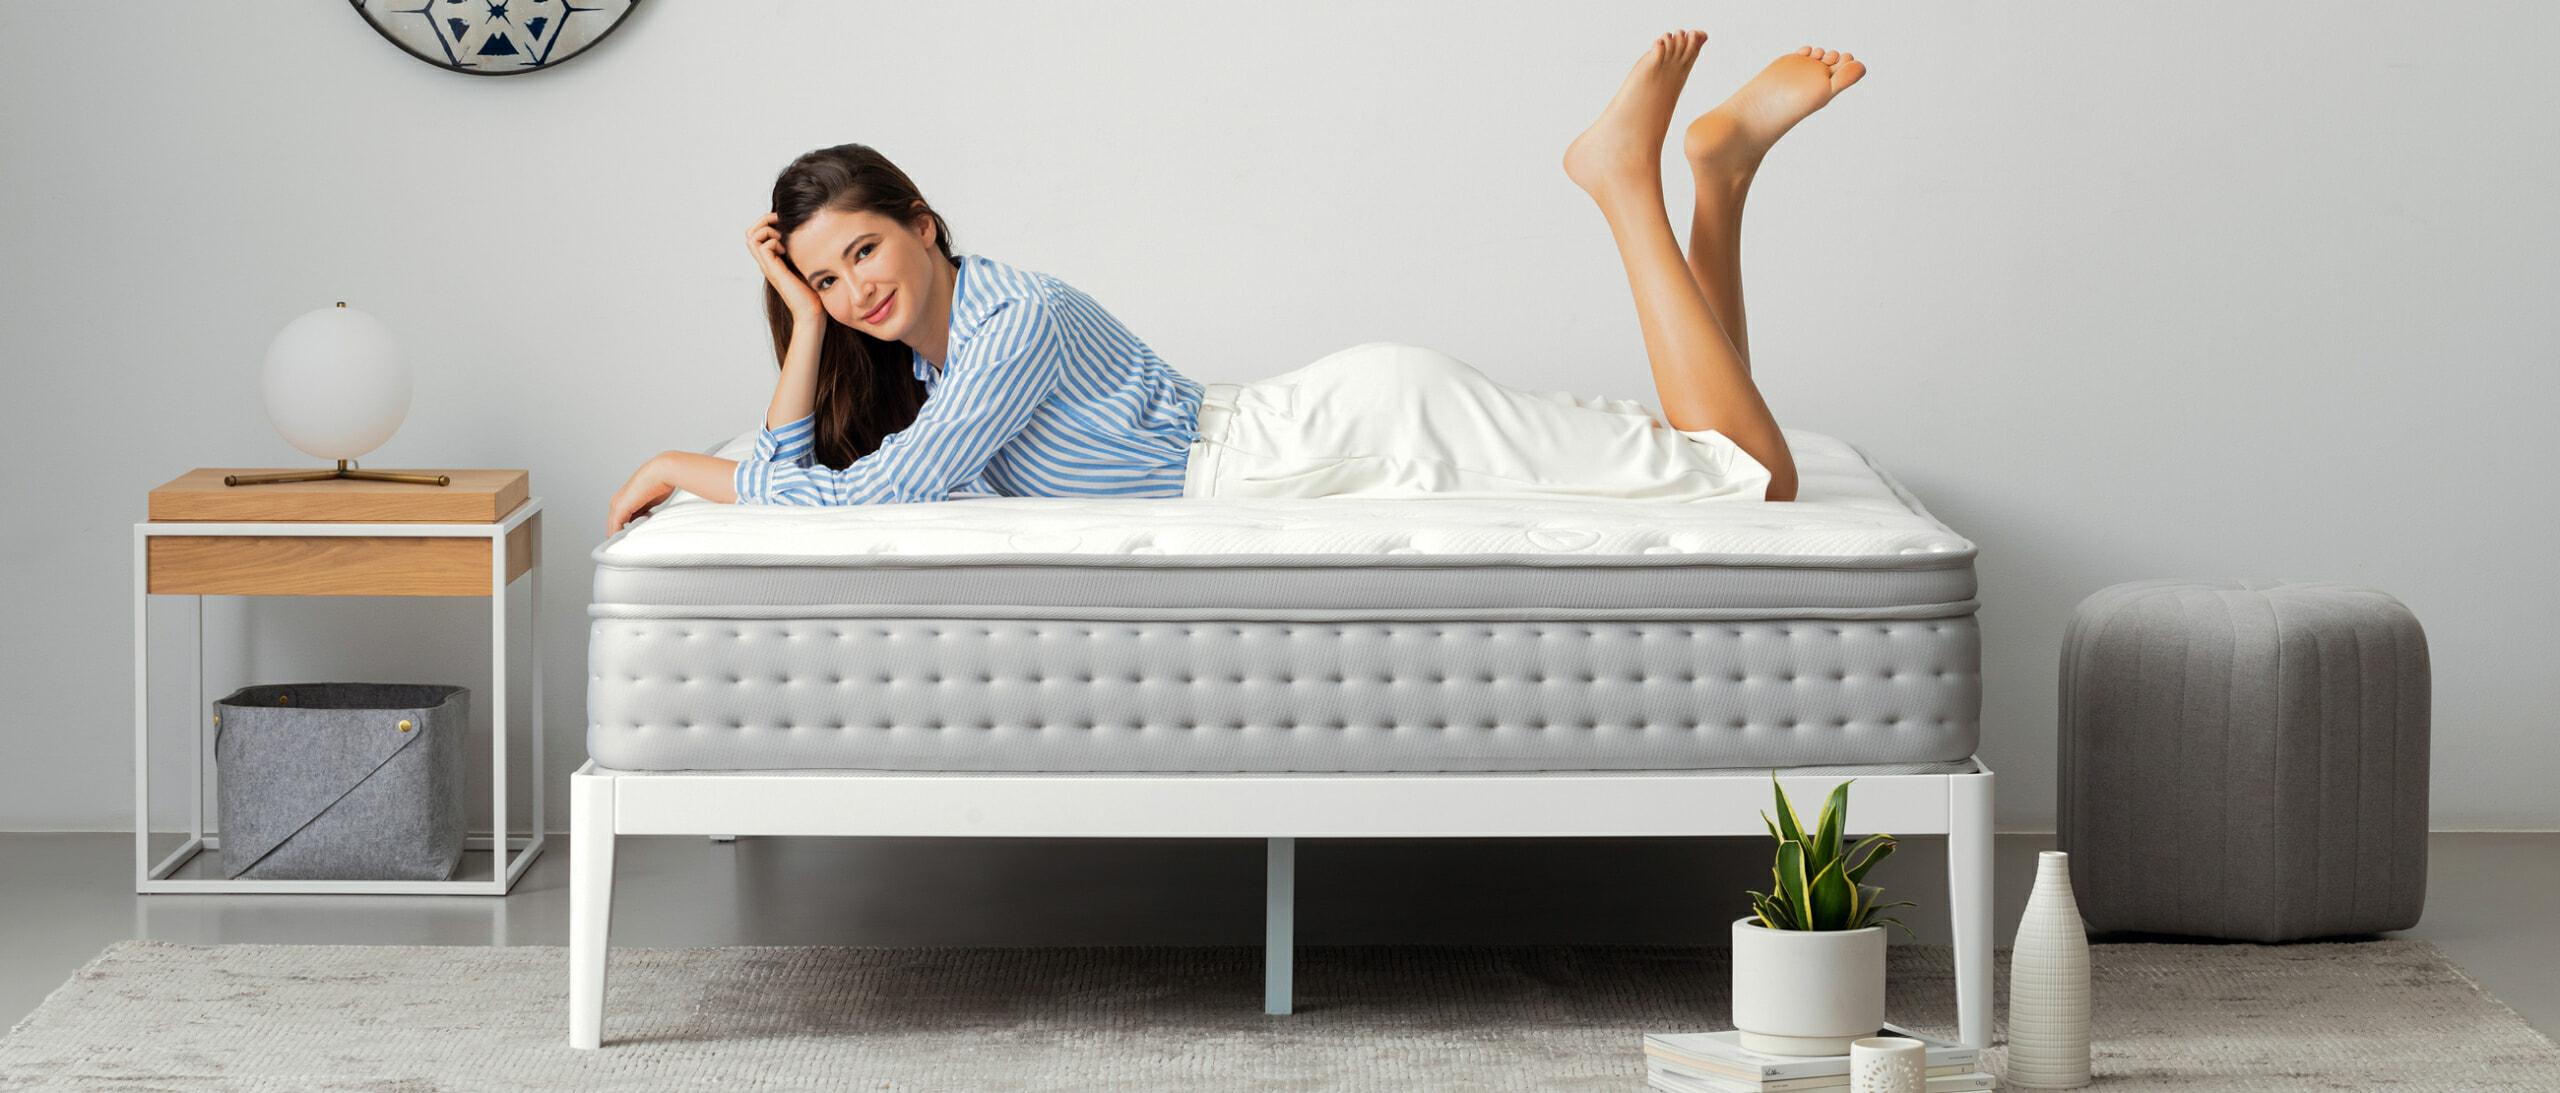 Mattress and bed bundle